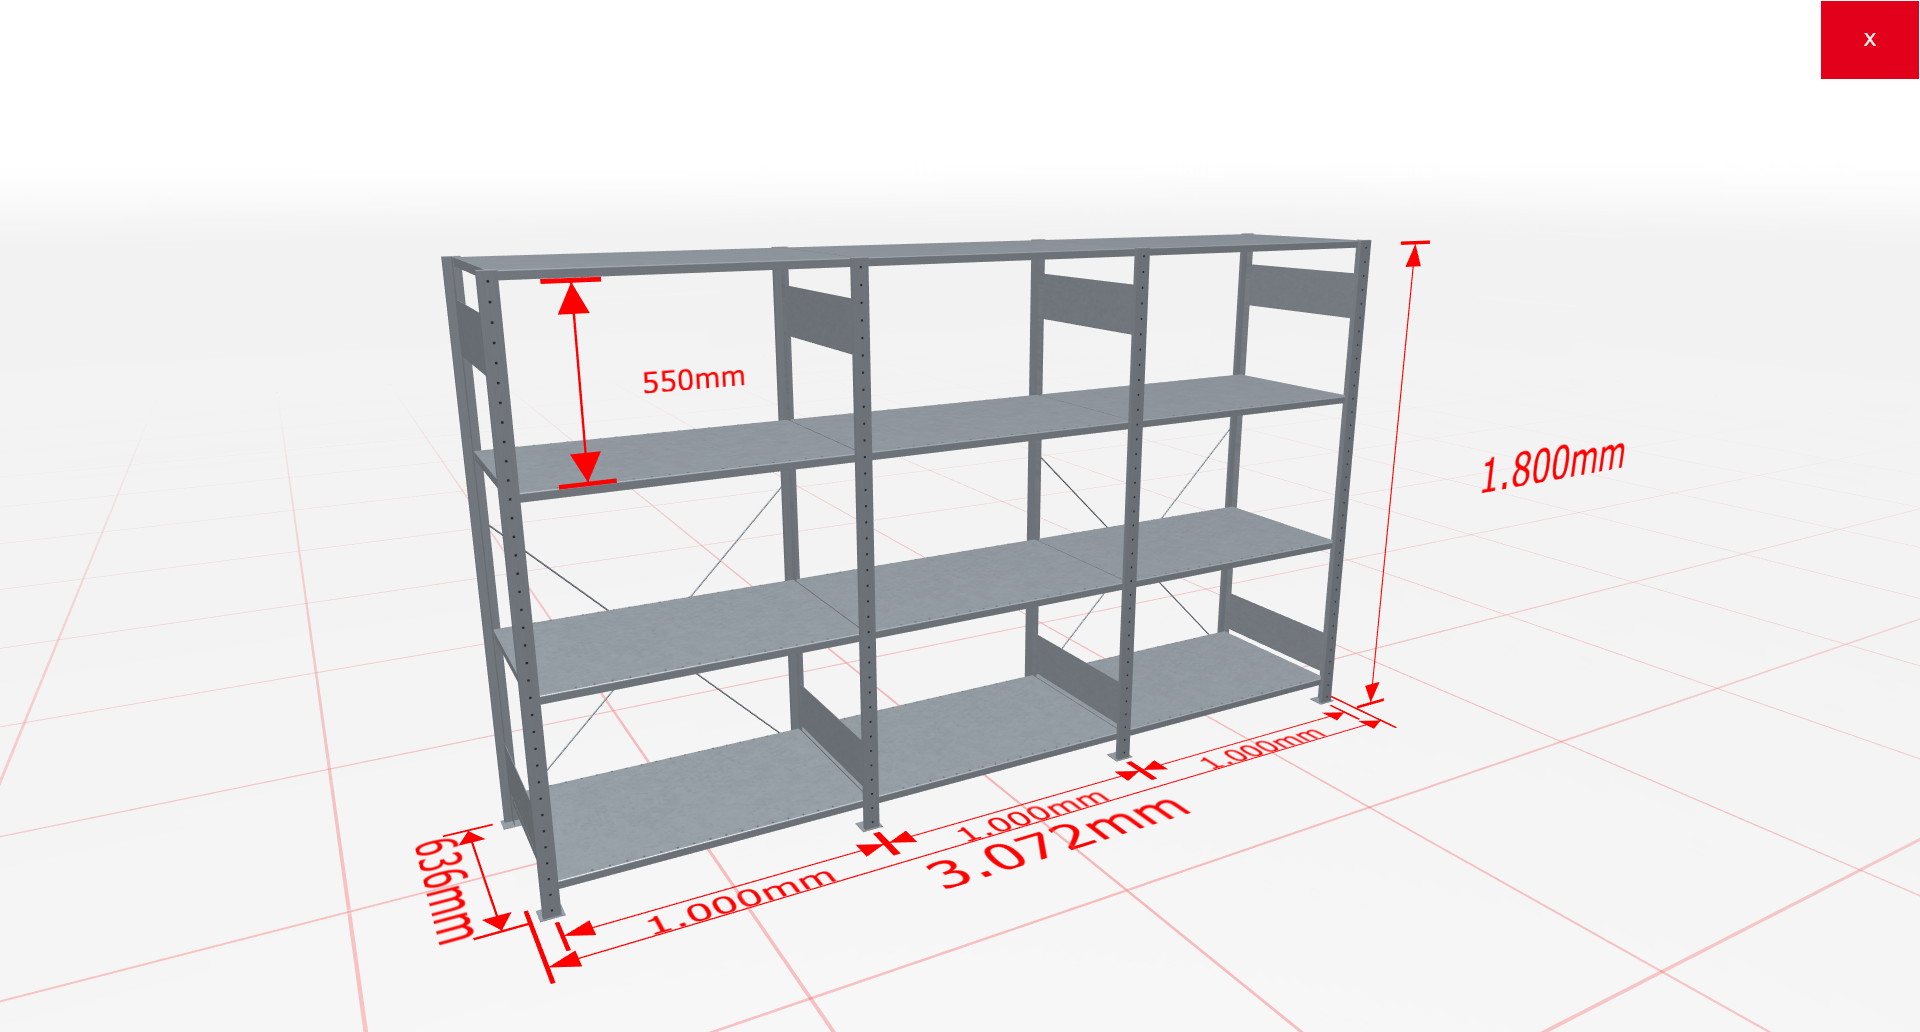 Fachbodenregal Komplettregal 1800x3072x600 mm (HxBxT) SCHULTE Lagertechnik verzinkt 4 Ebenen  150 kg je Boden